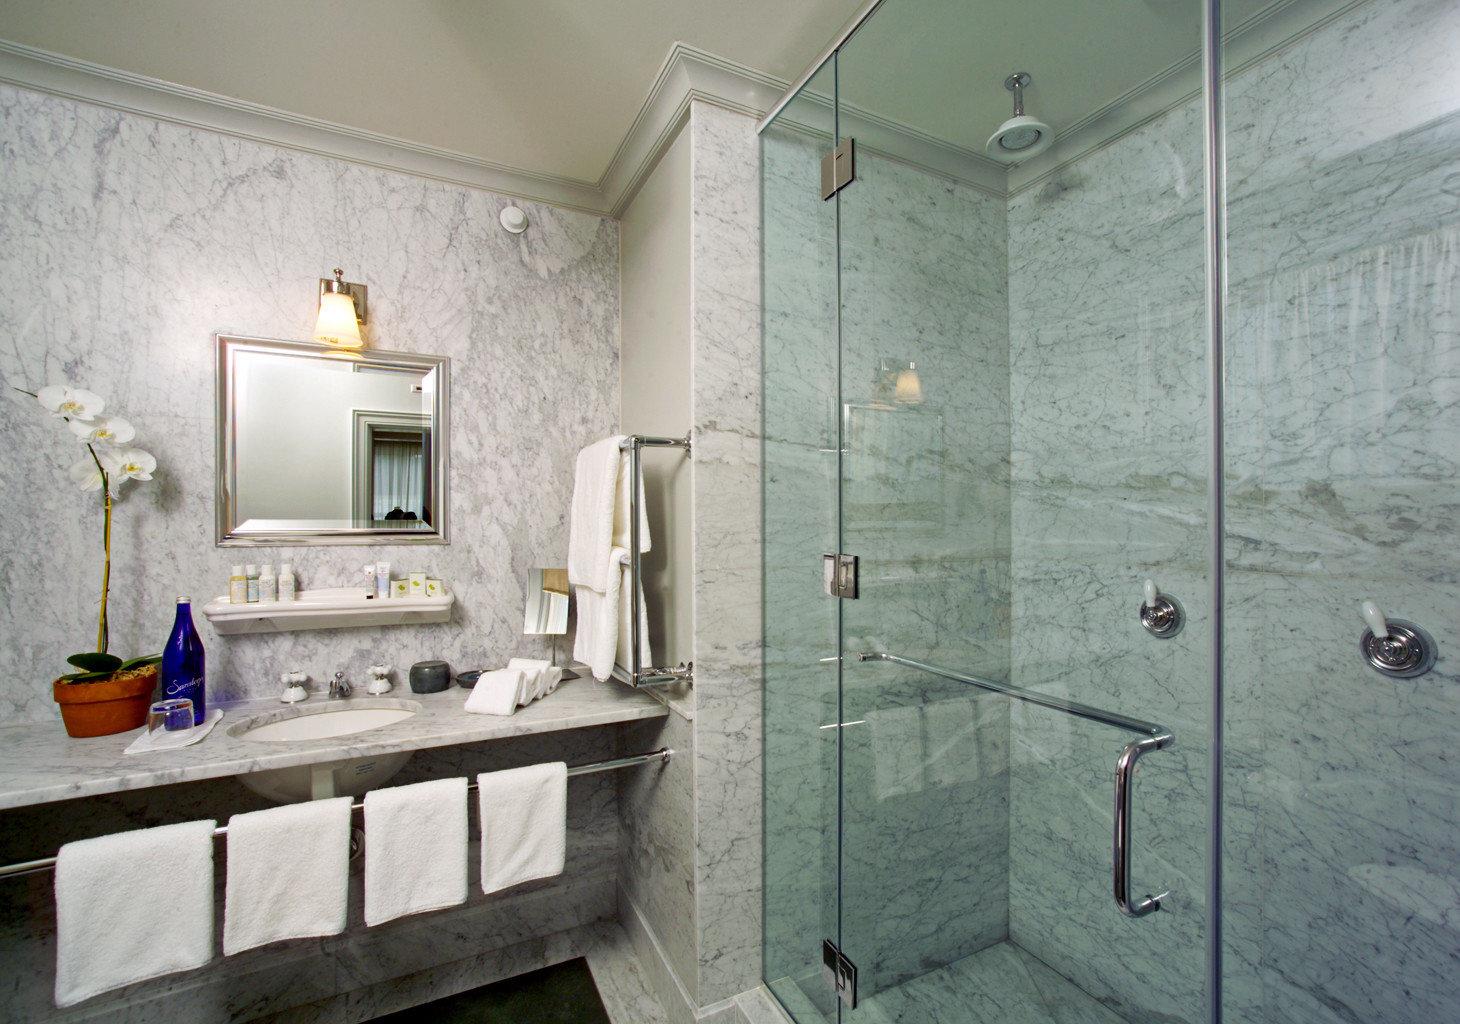 Bath Boutique Modern bathroom property home plumbing fixture flooring rack